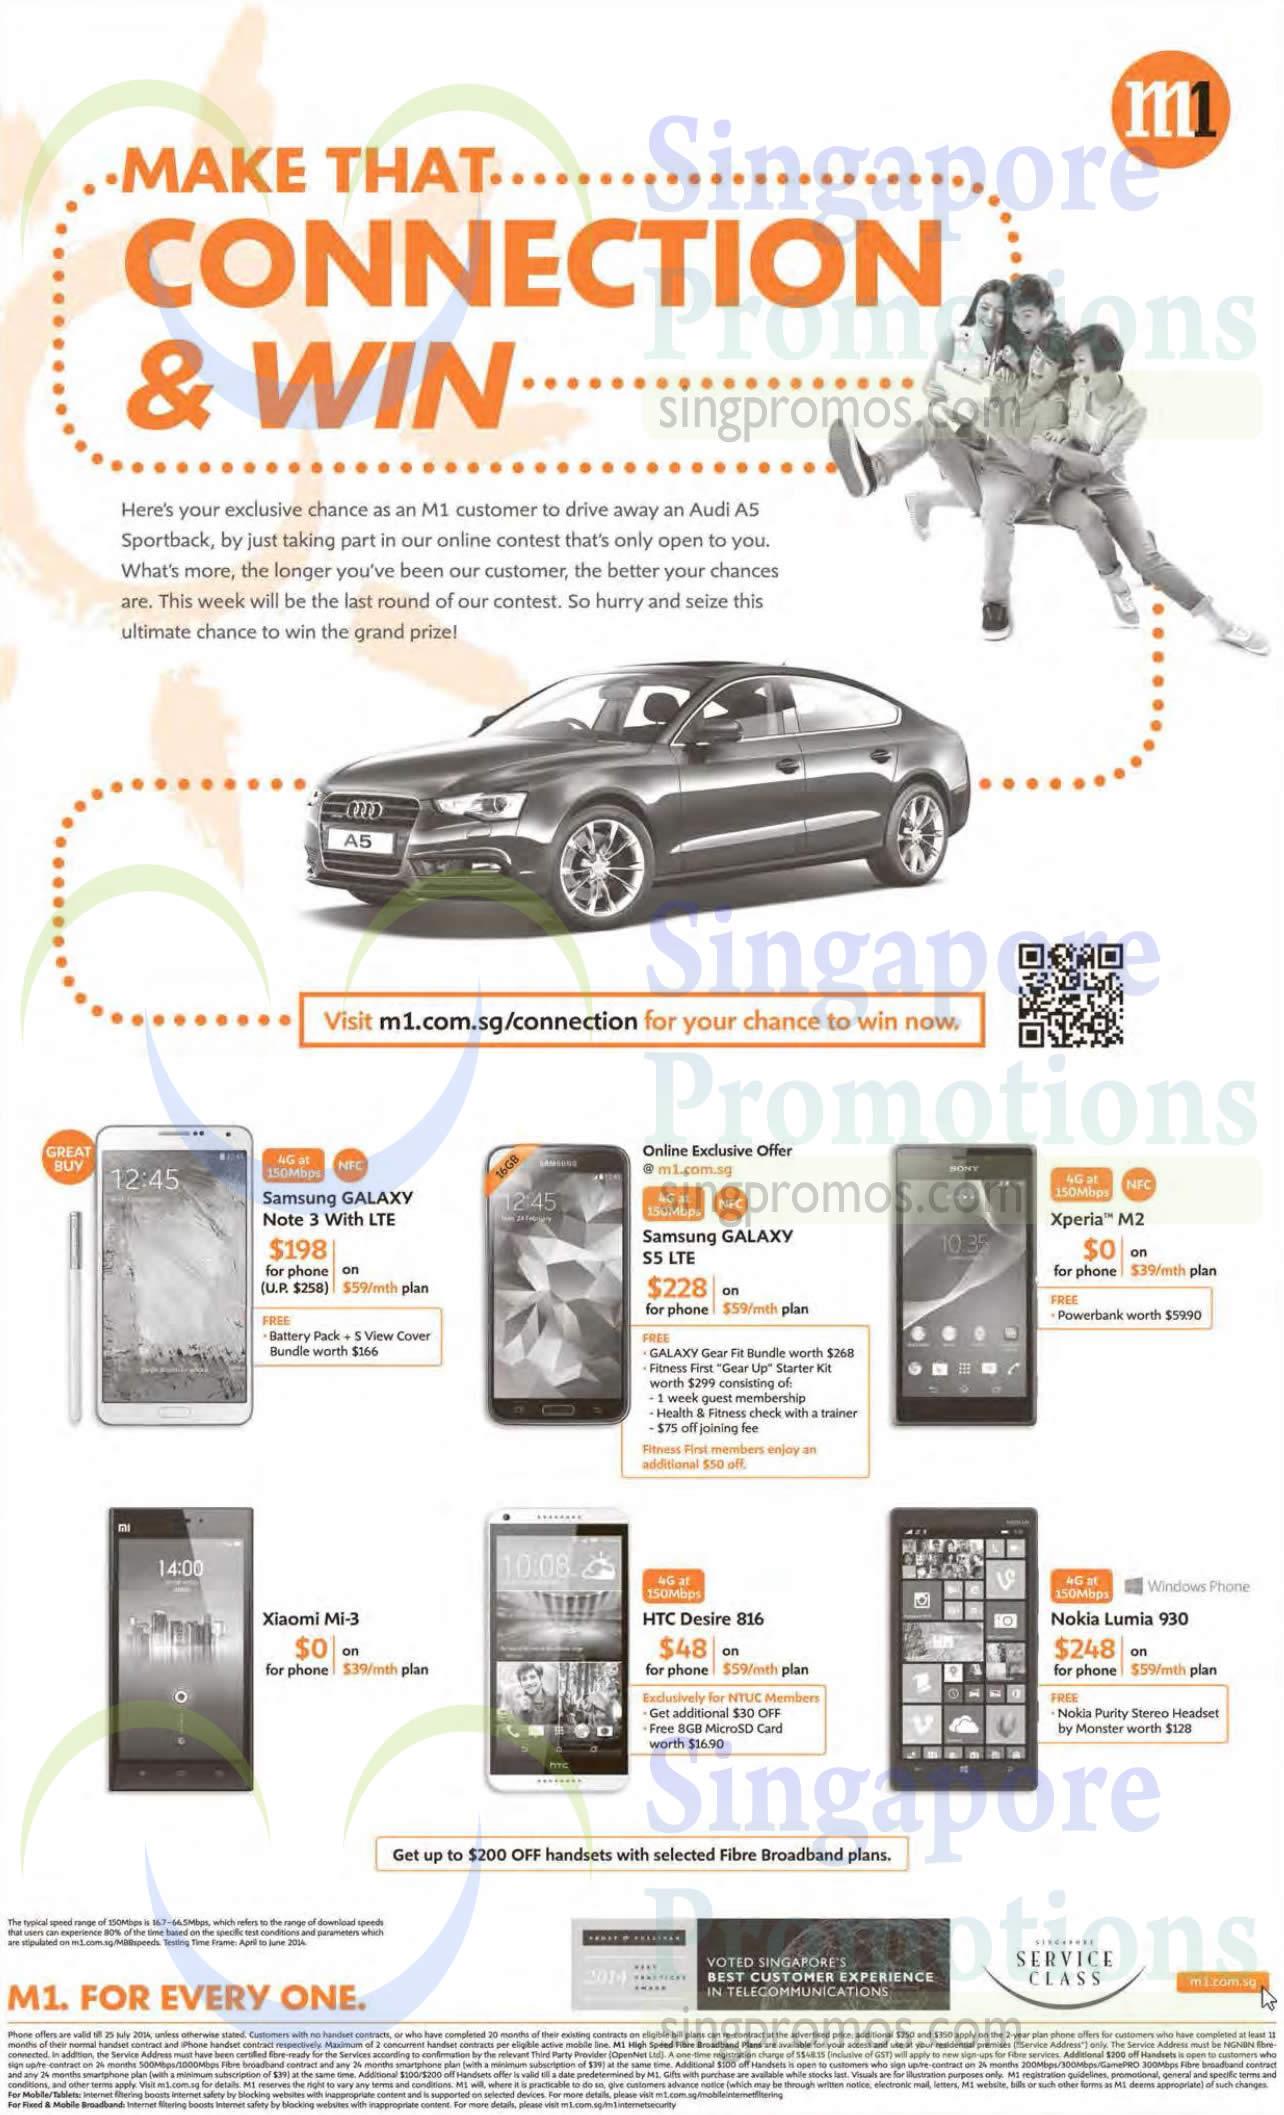 Samsung Galaxy Note 3, Samsung Galaxy S5, Xiaomi Mi3, HTC Desire 816, Nokia Lumia 930, Sony Xperia M2